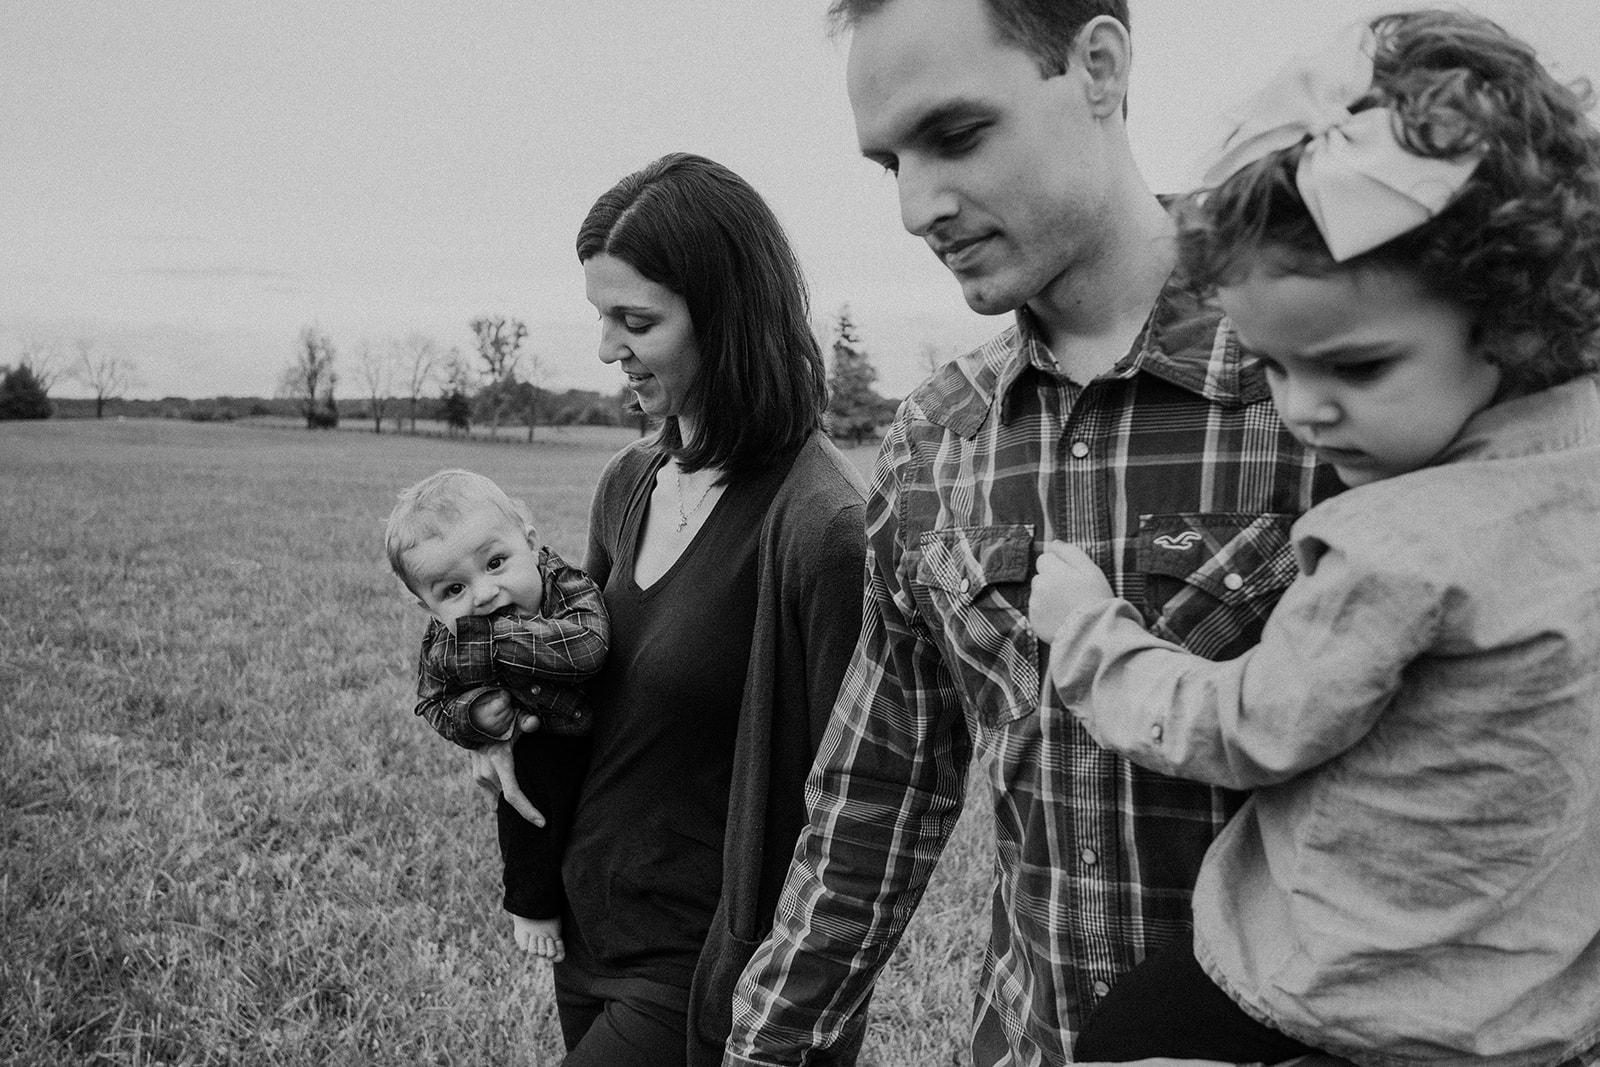 A family walks through a field at Morven Park.